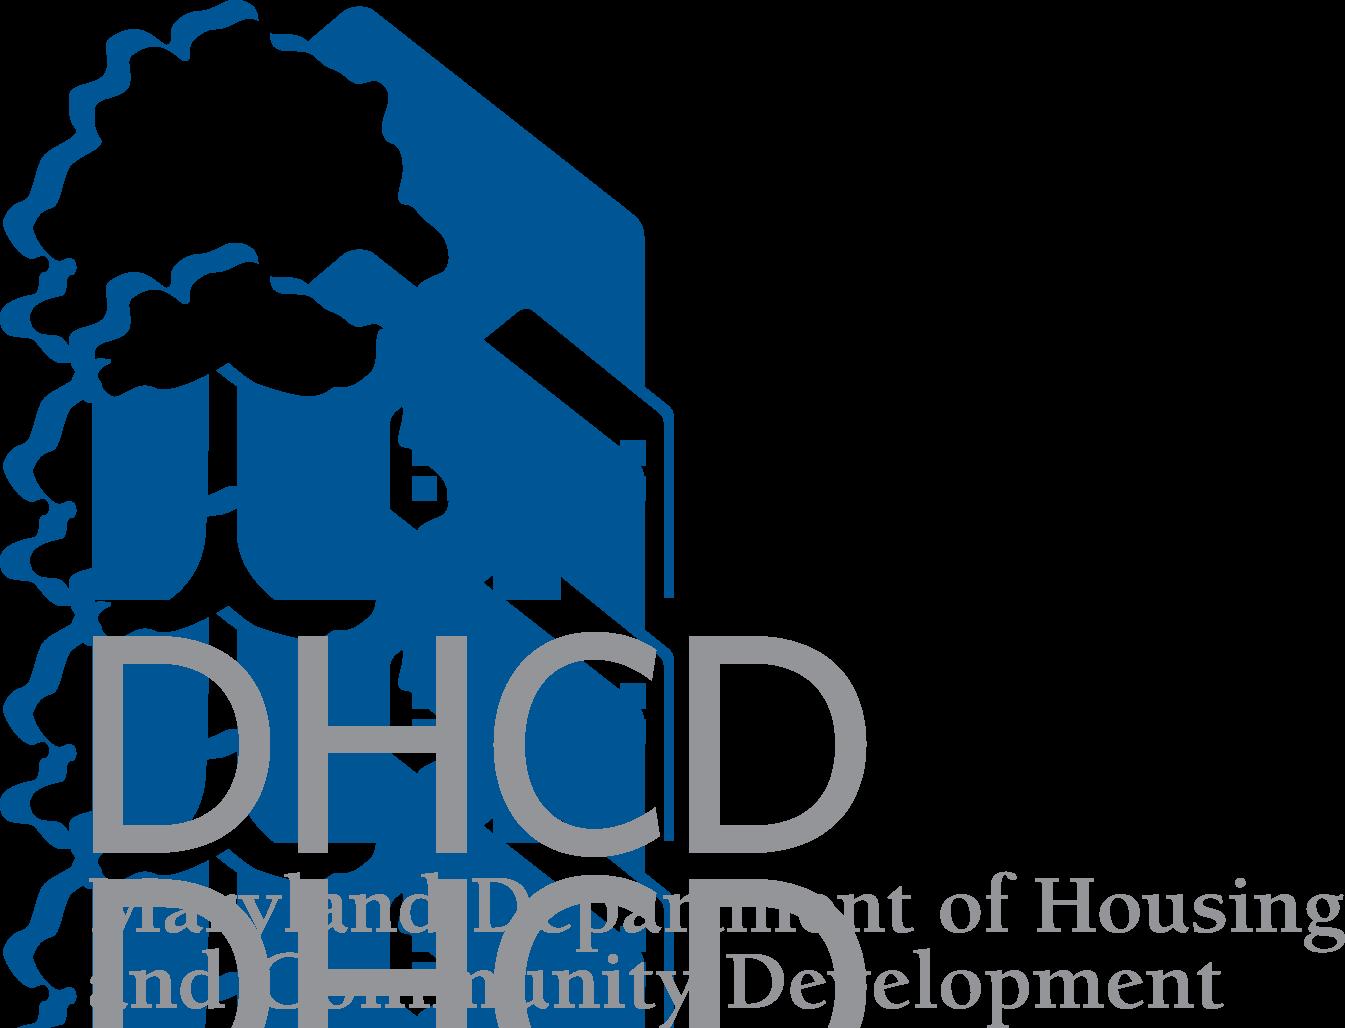 Job Announcement: HCD COMMUNITY PROGRAM ADMINISTRATOR I (C19012.